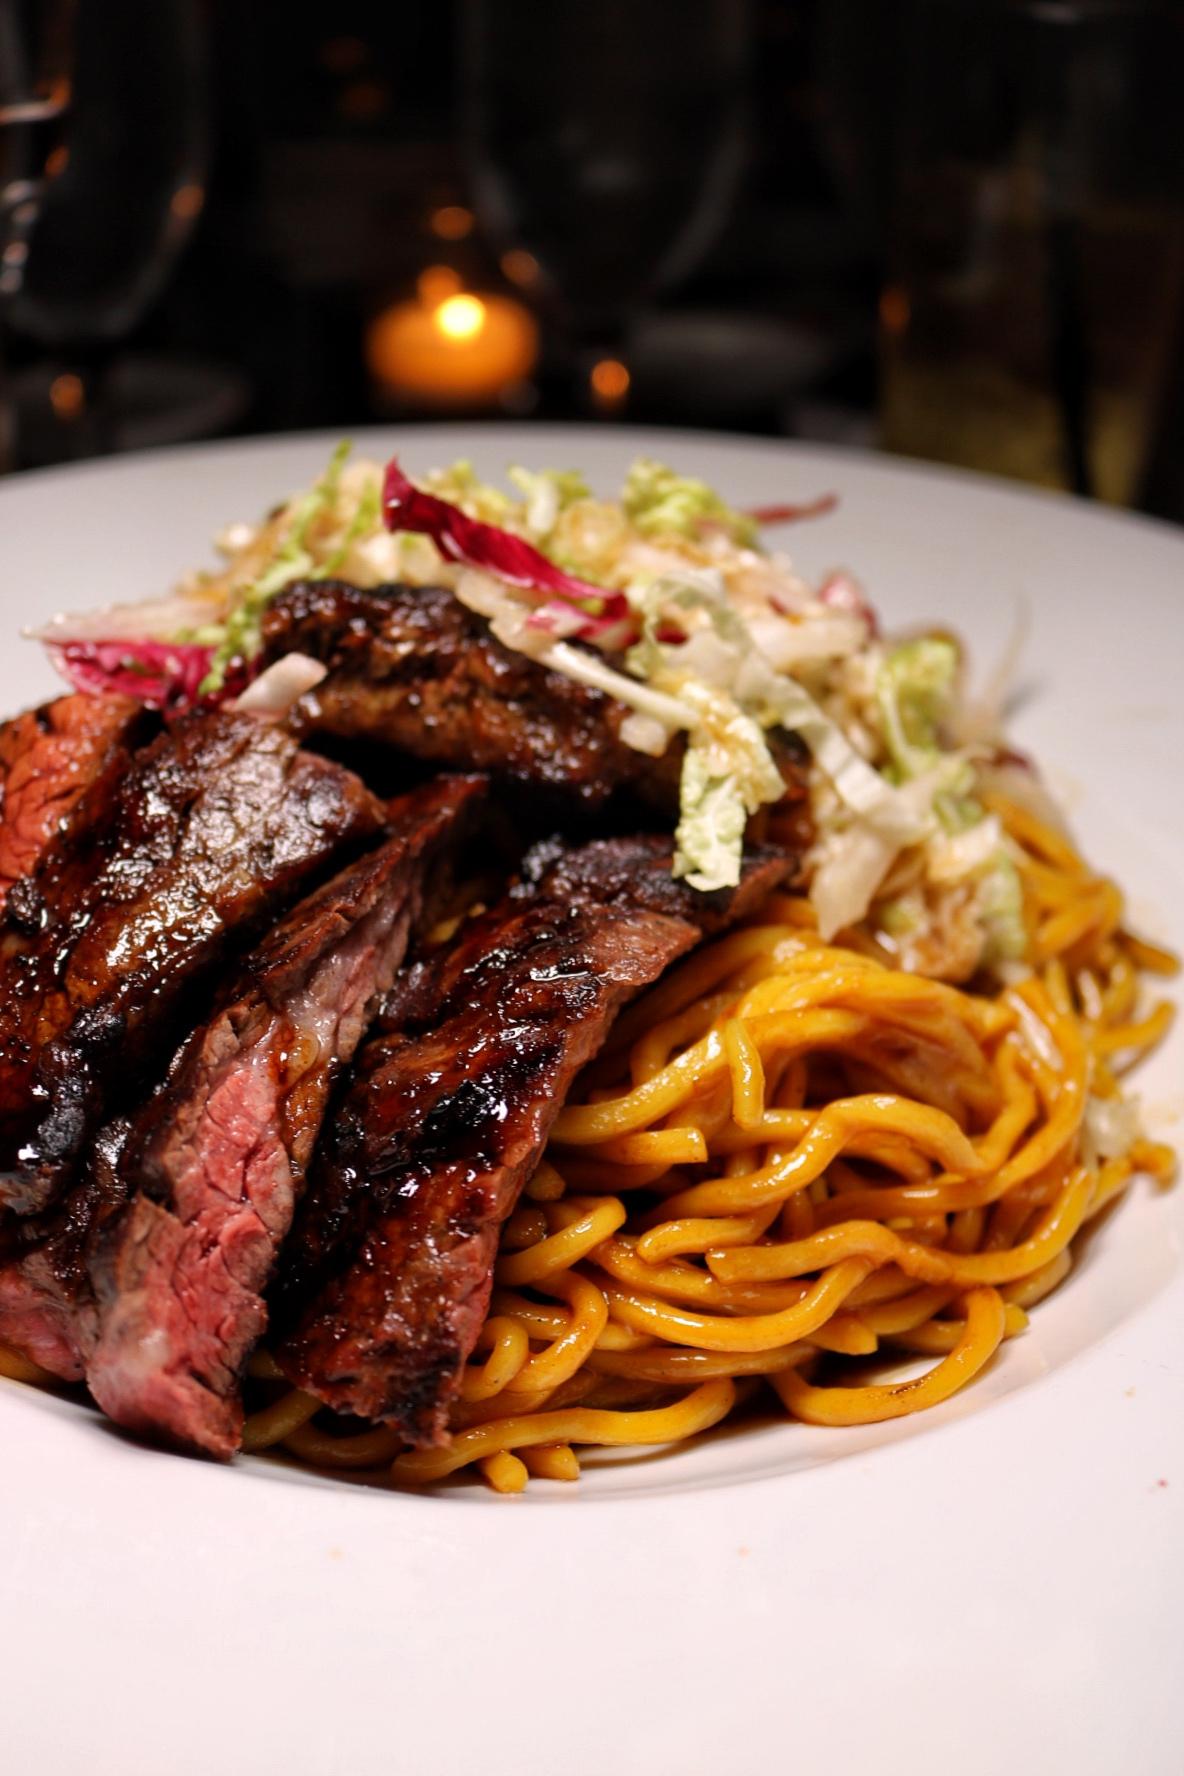 Red Lantern - Steak Teriyaki Noodles